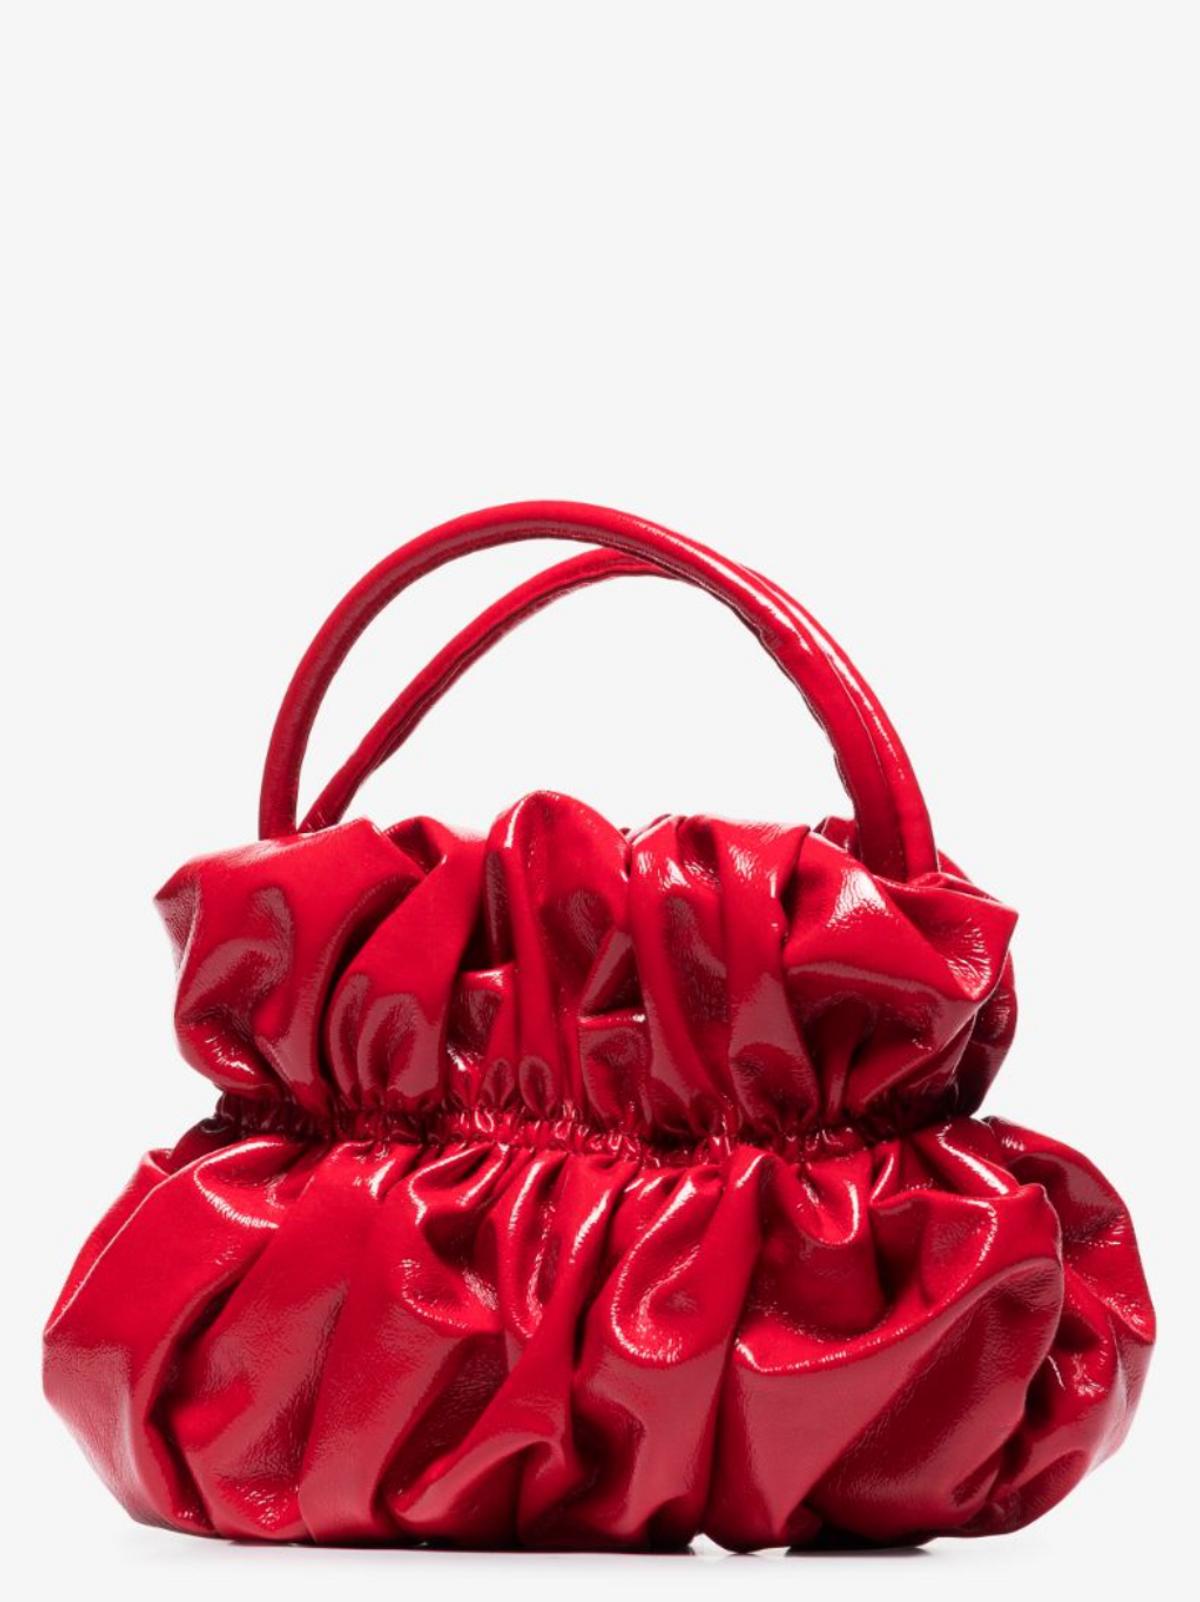 Red Kawasak Bumpy Top Handle Bag